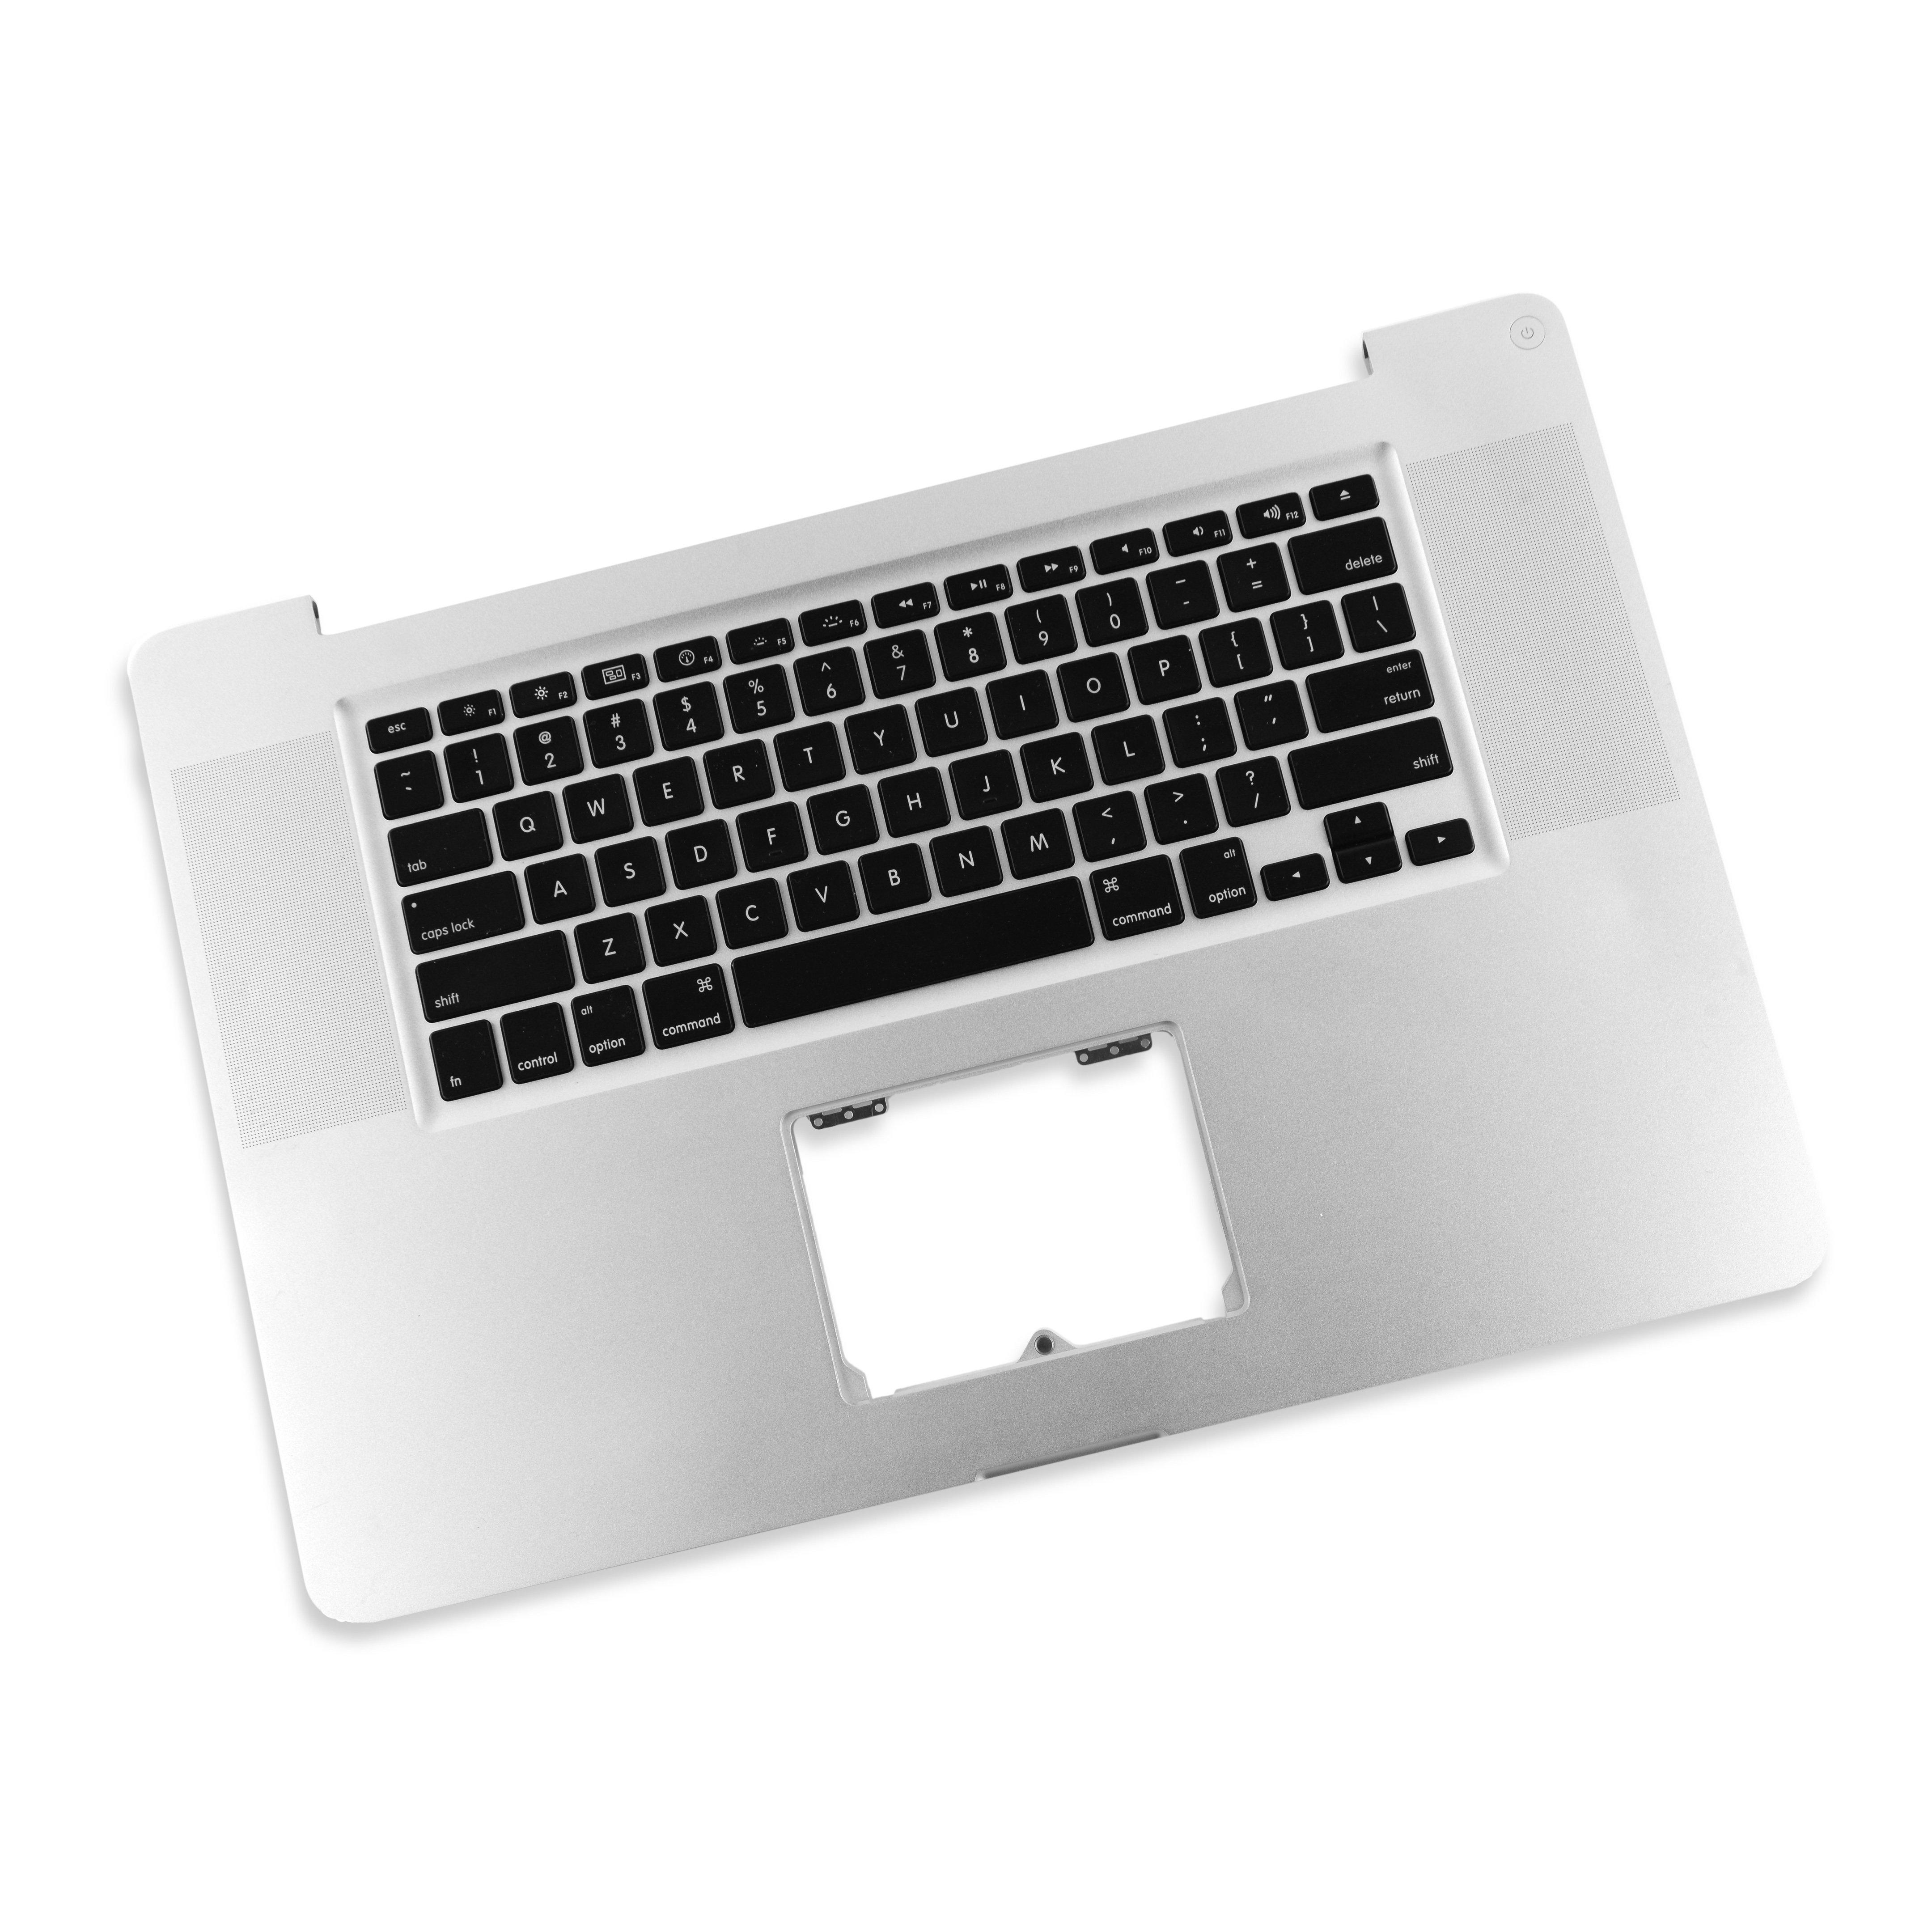 "MacBook Pro 17"" Unibody (Early 2011) Upper Case Image"